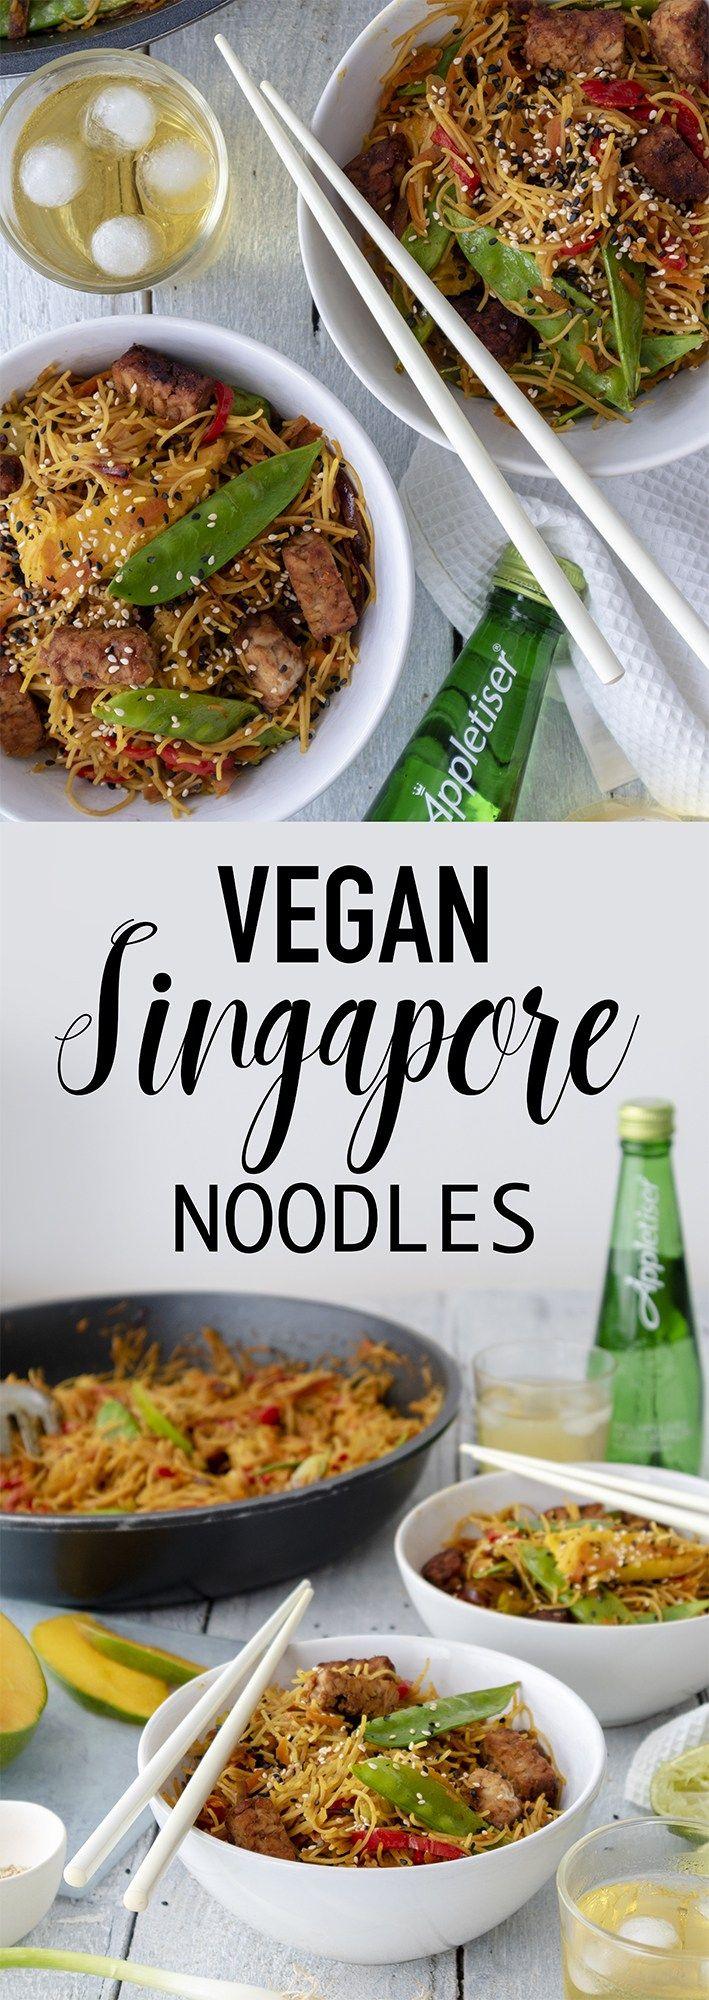 Vegan Singapore Noodles Recipe Cheap Vegan Meals Vegan Lunch Recipes Vegan Dinner Recipes